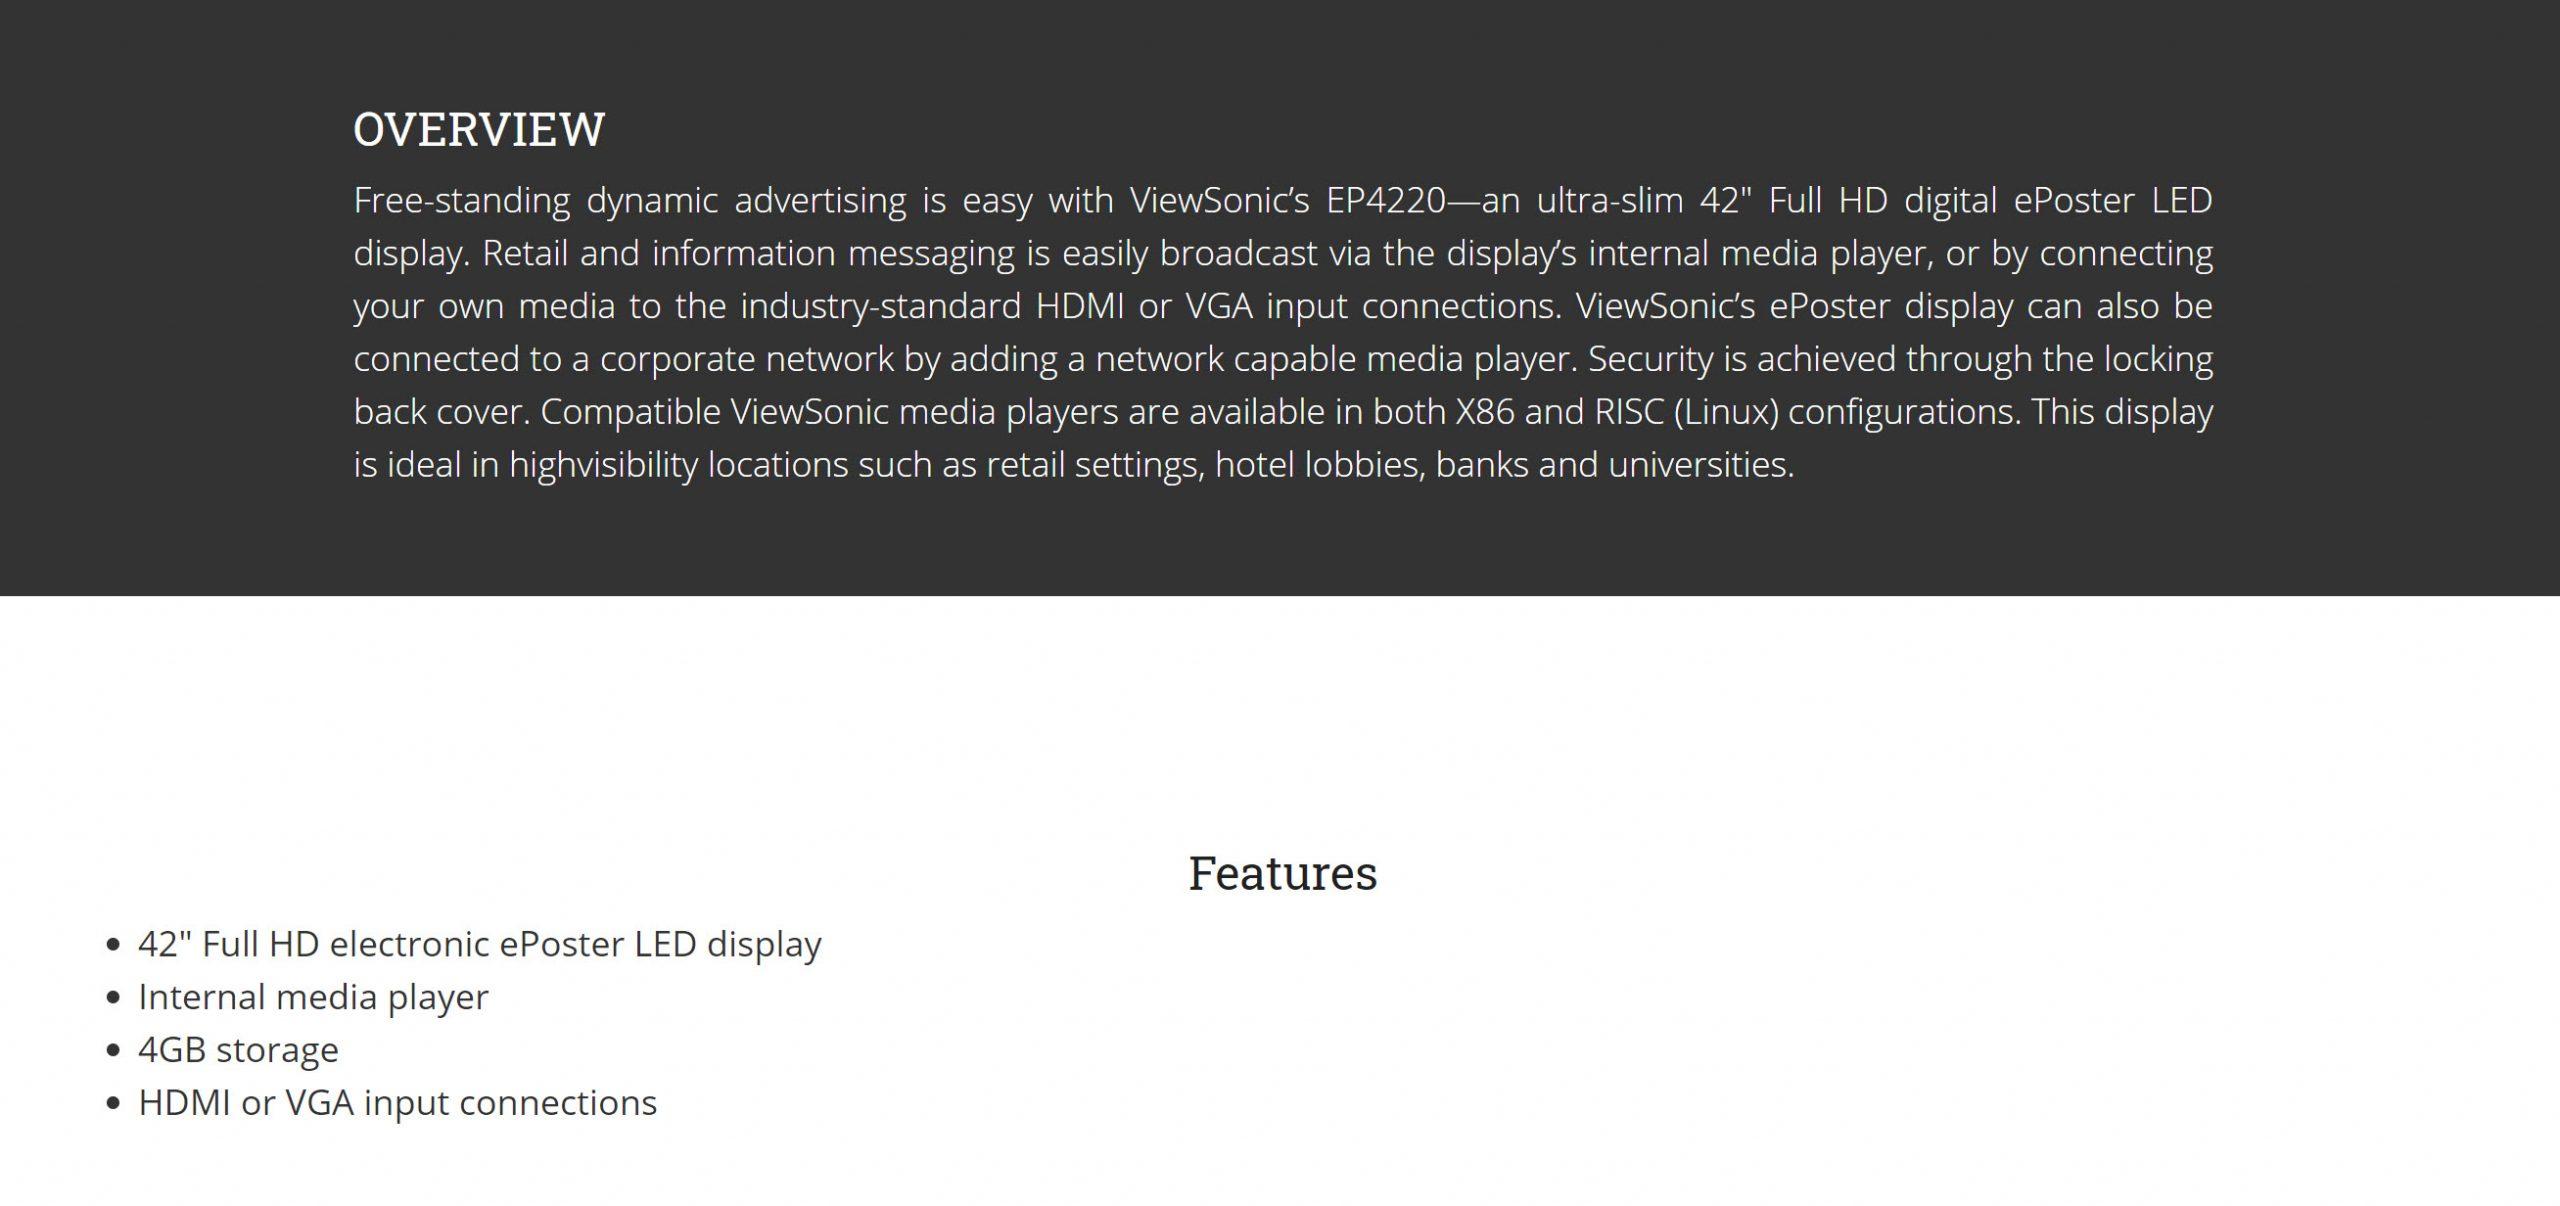 ViewSonic EP4220 42″ Ultra-Slim Full HD Digital ePoster LED Display – New